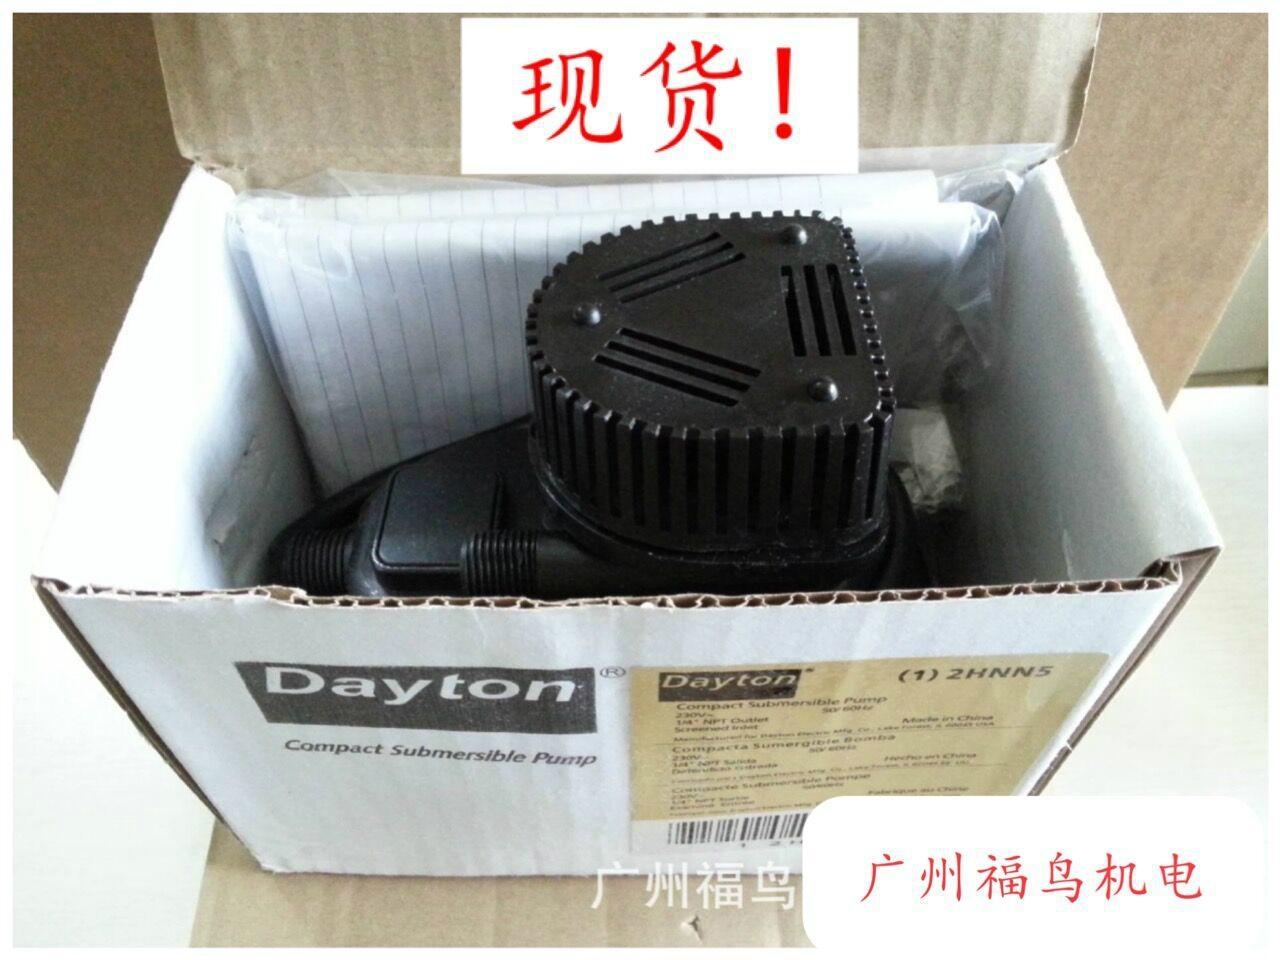 DAYTON水泵, 现货型号:2HNN5